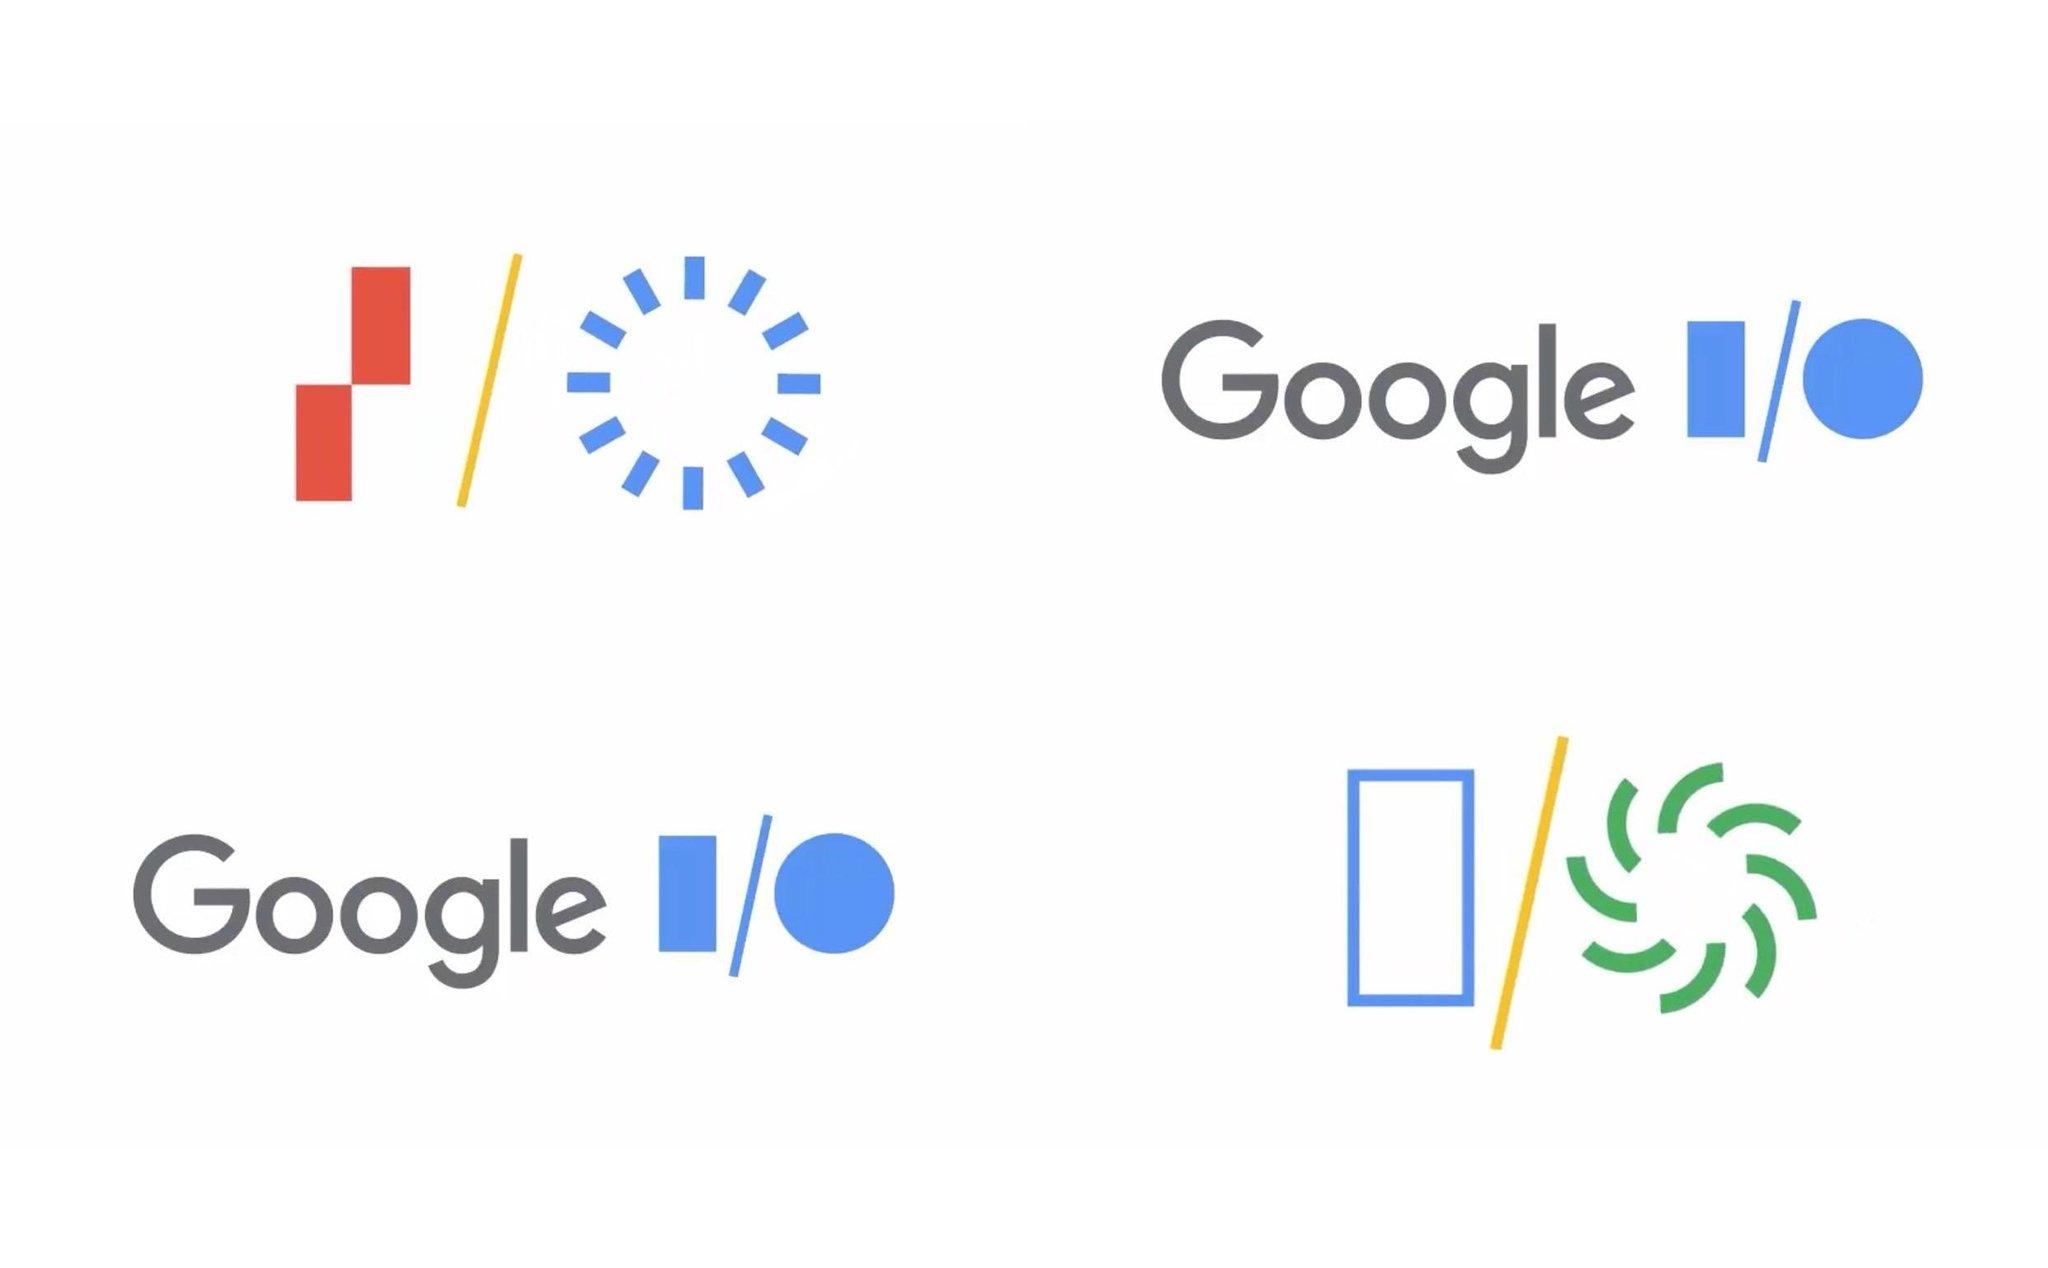 google-io-2020-jpg.9756